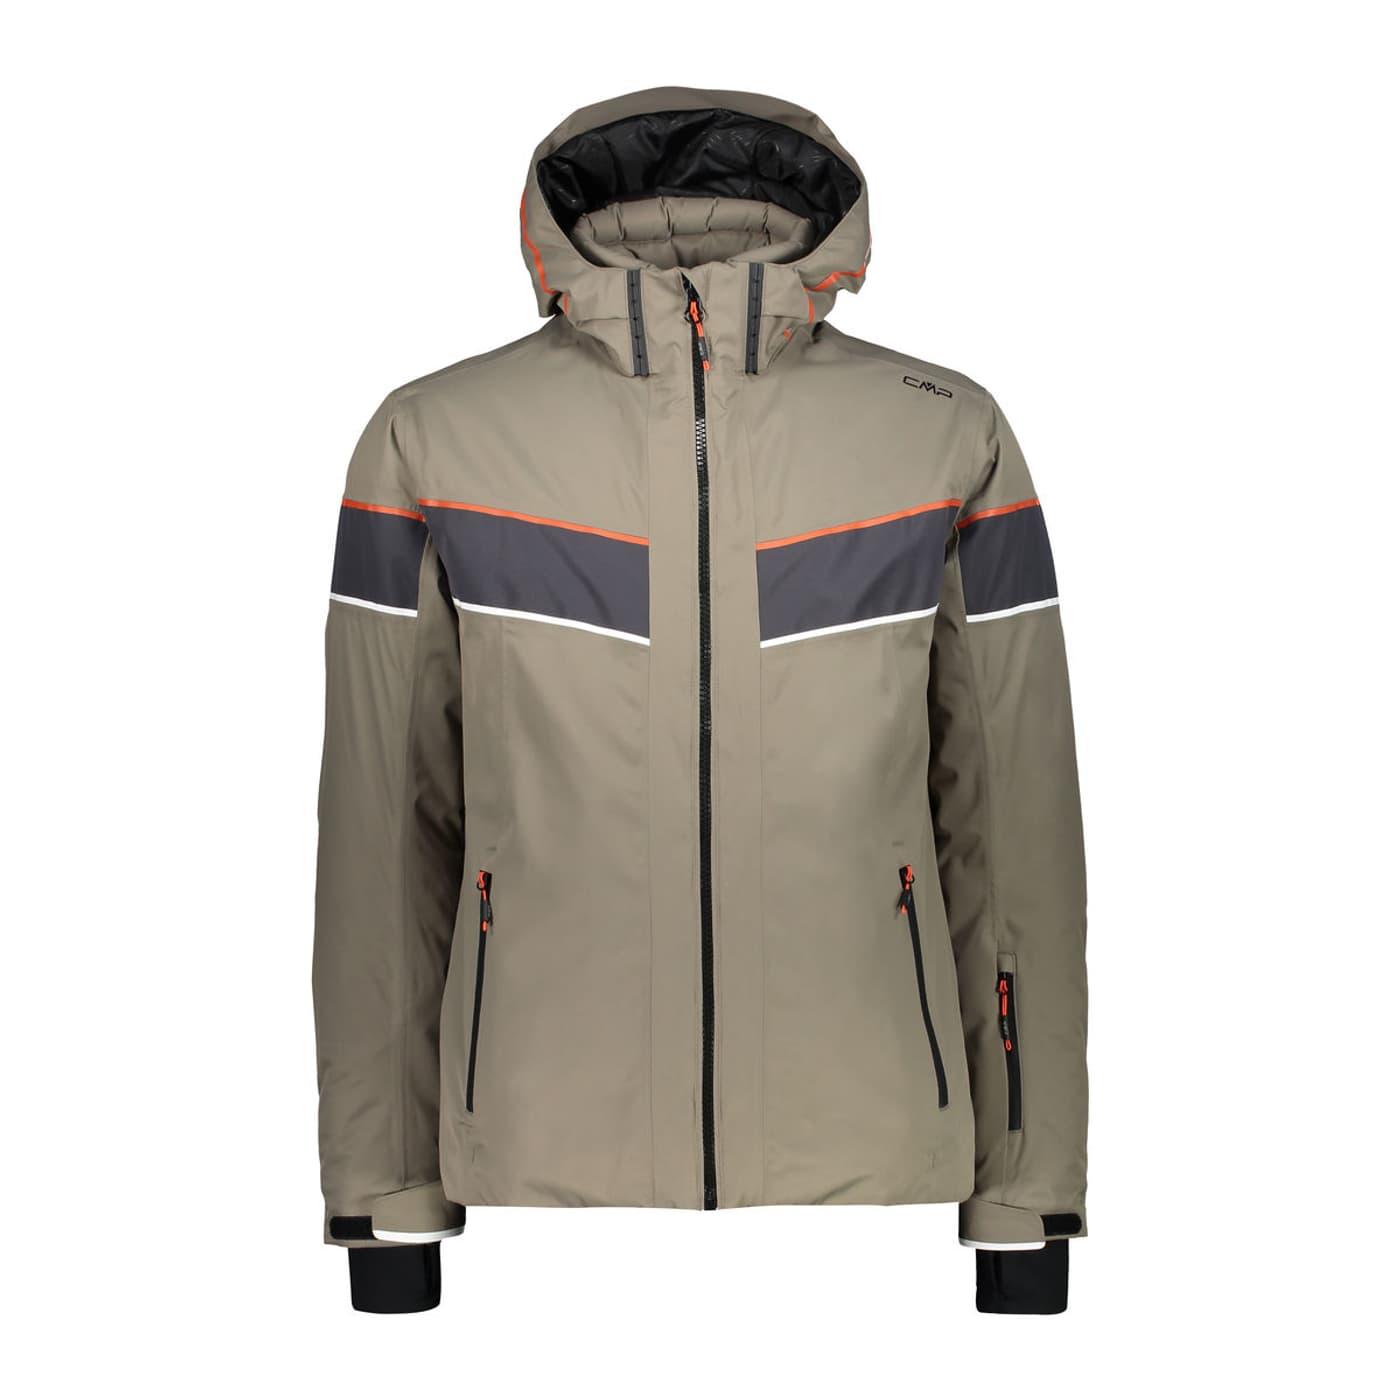 CMP HERREN SKIJACKE Winterjacke Jacke Kapuze Zip Hood Jacket